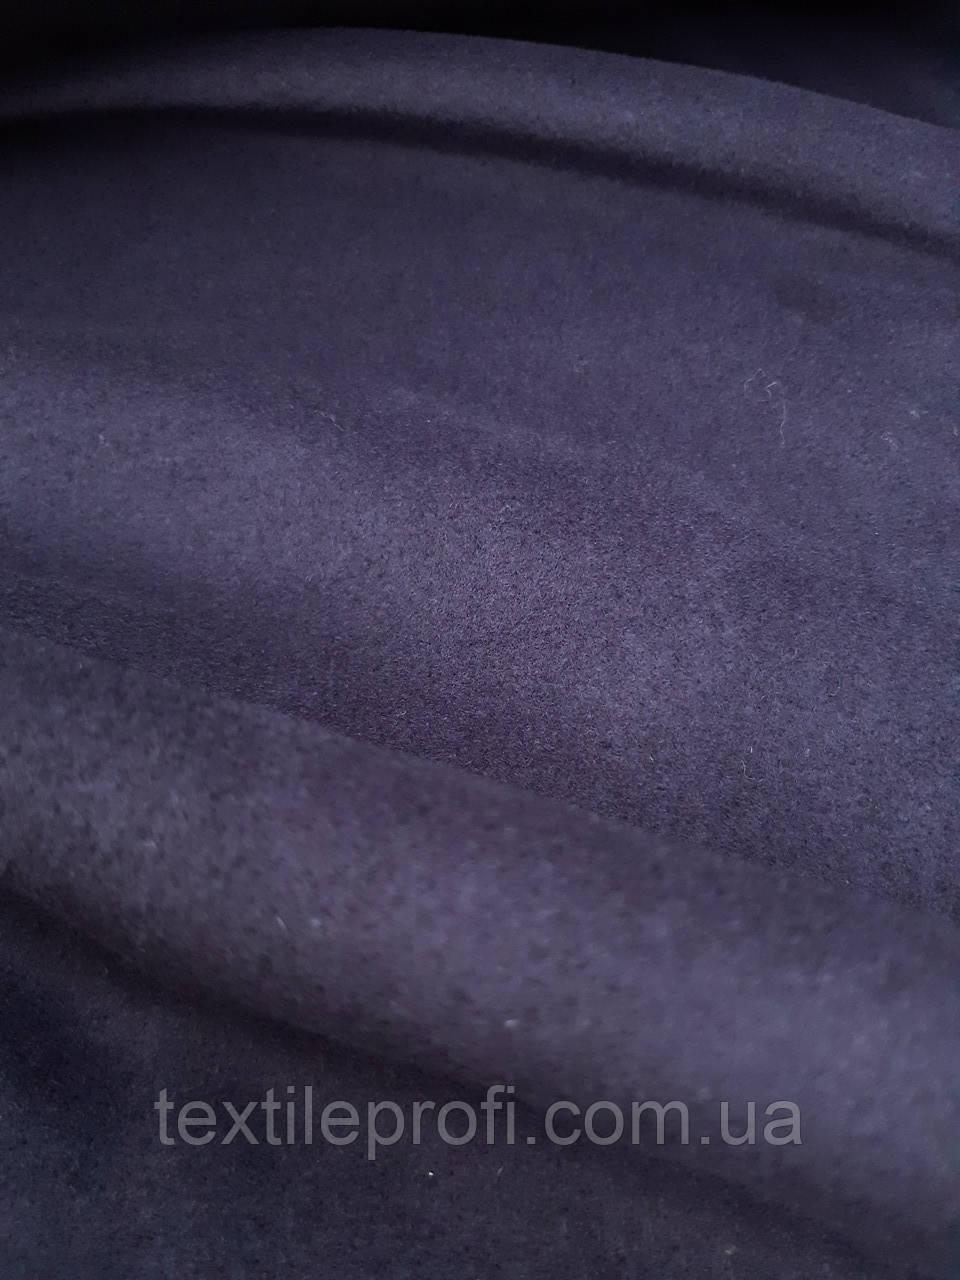 Кашемир темно - синего цвета, фото 1